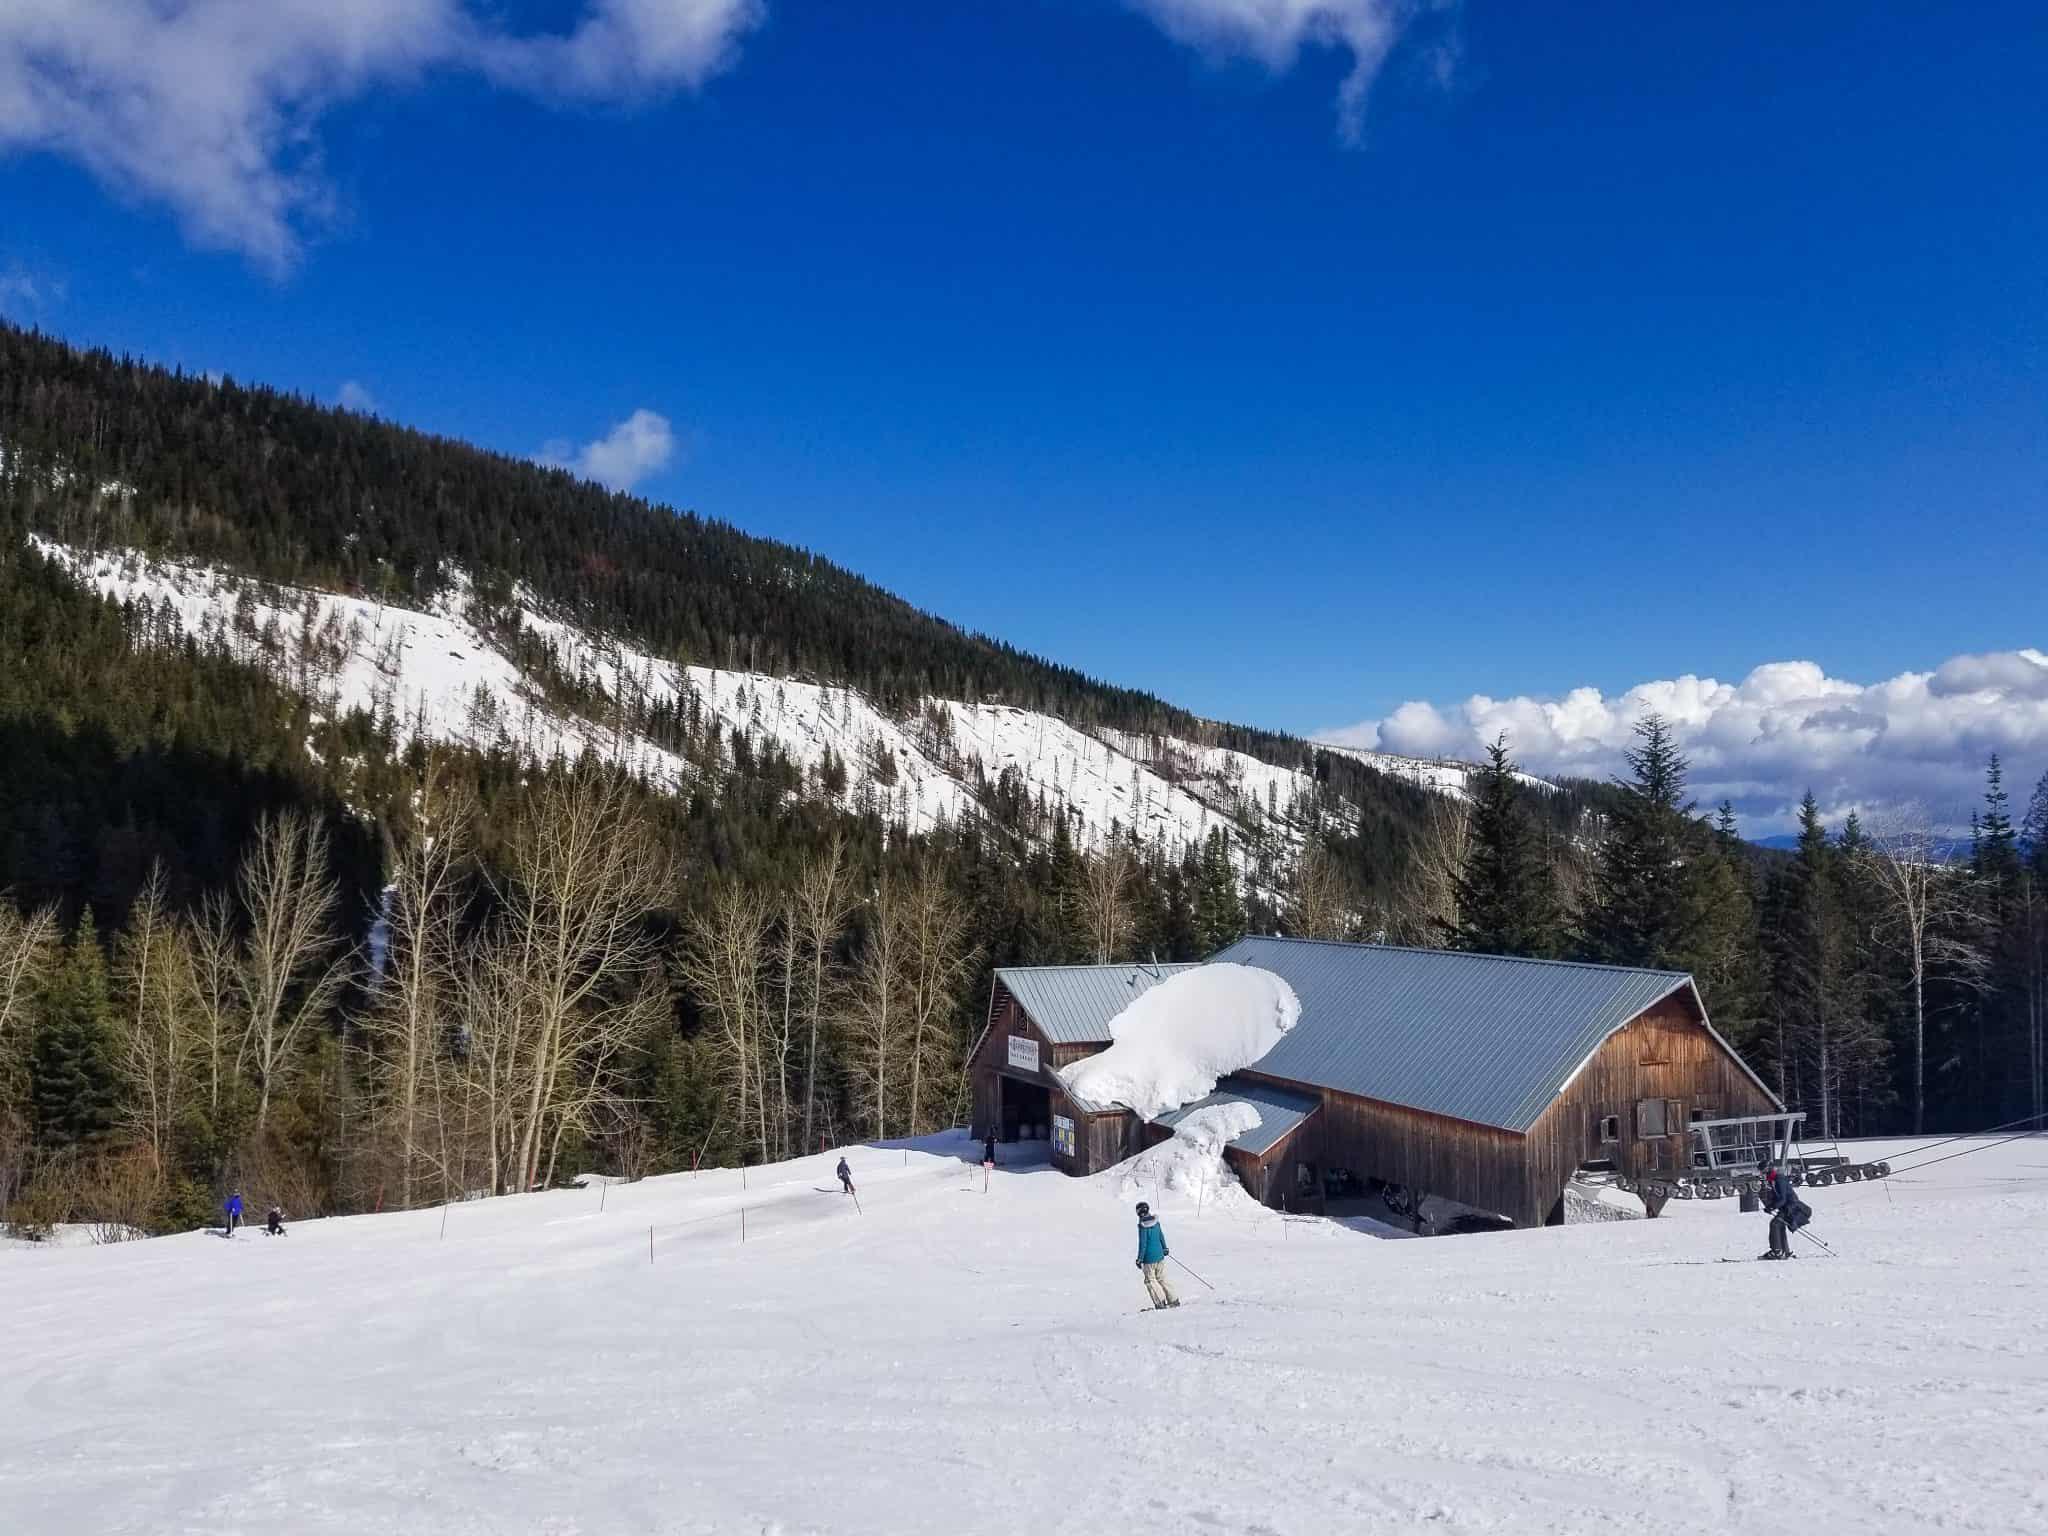 Ski areas in Idaho